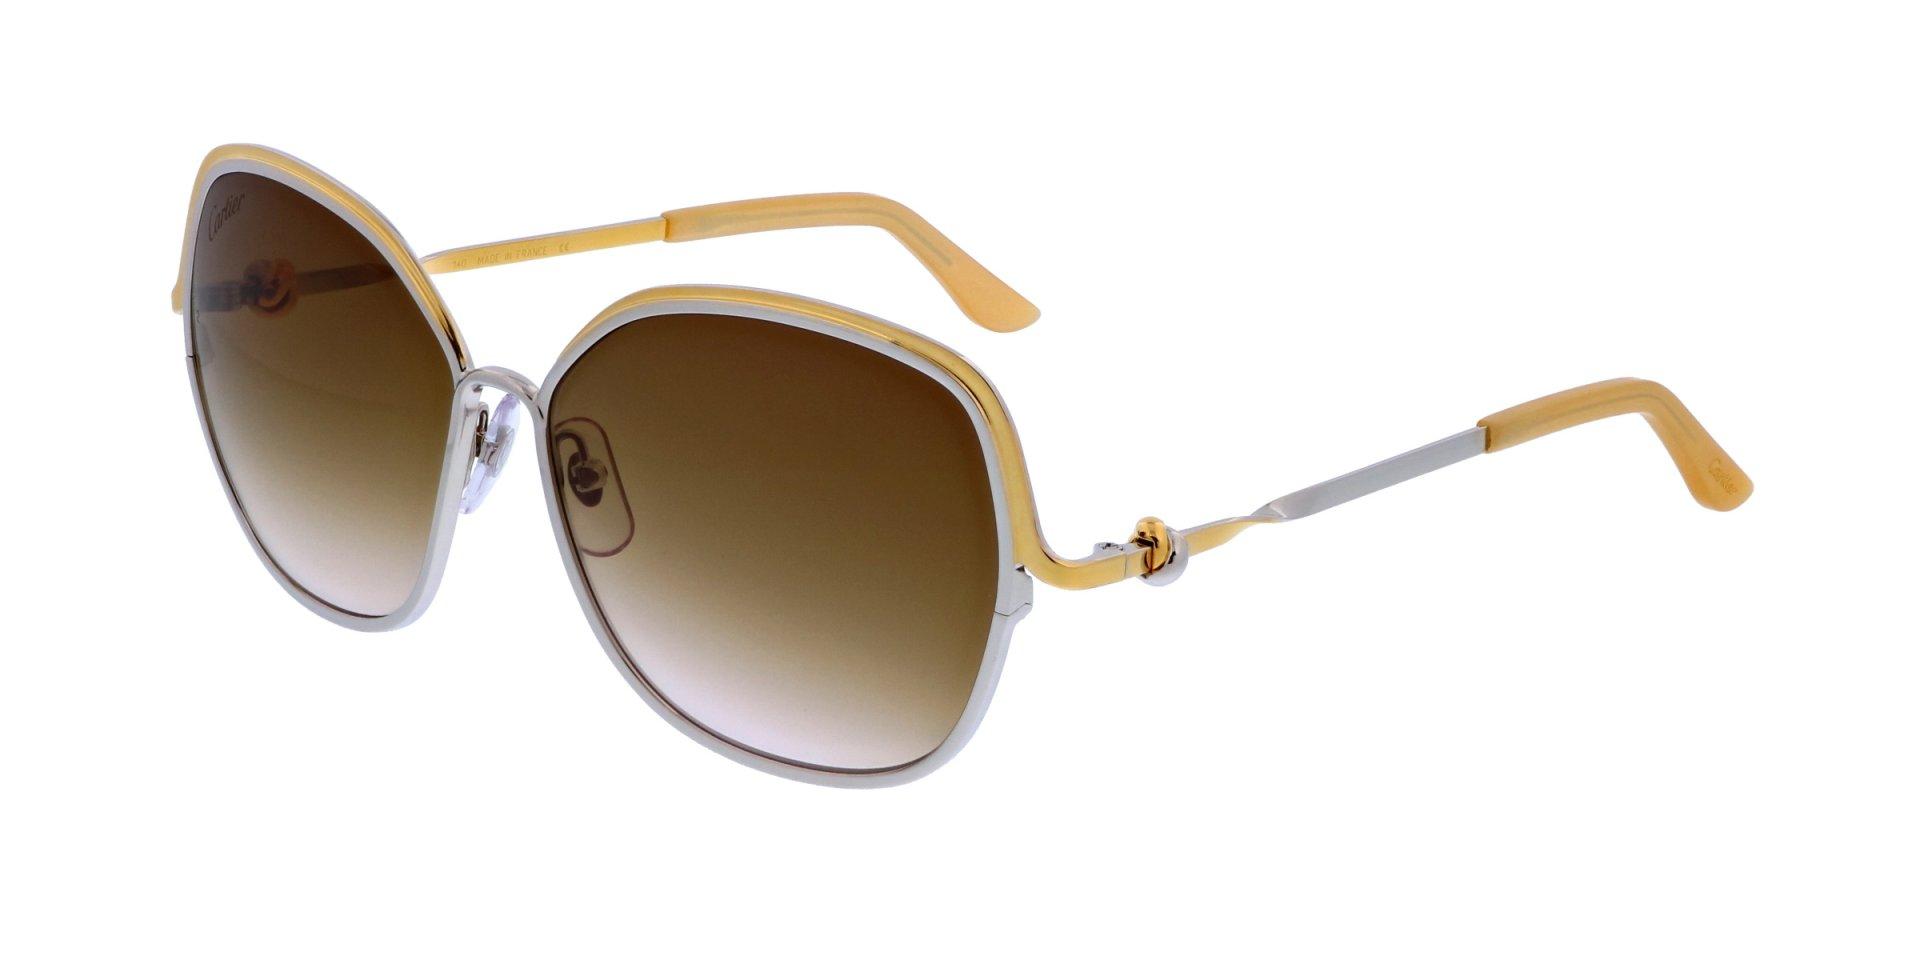 46a348bc8d219 Sunglasses CARTIER